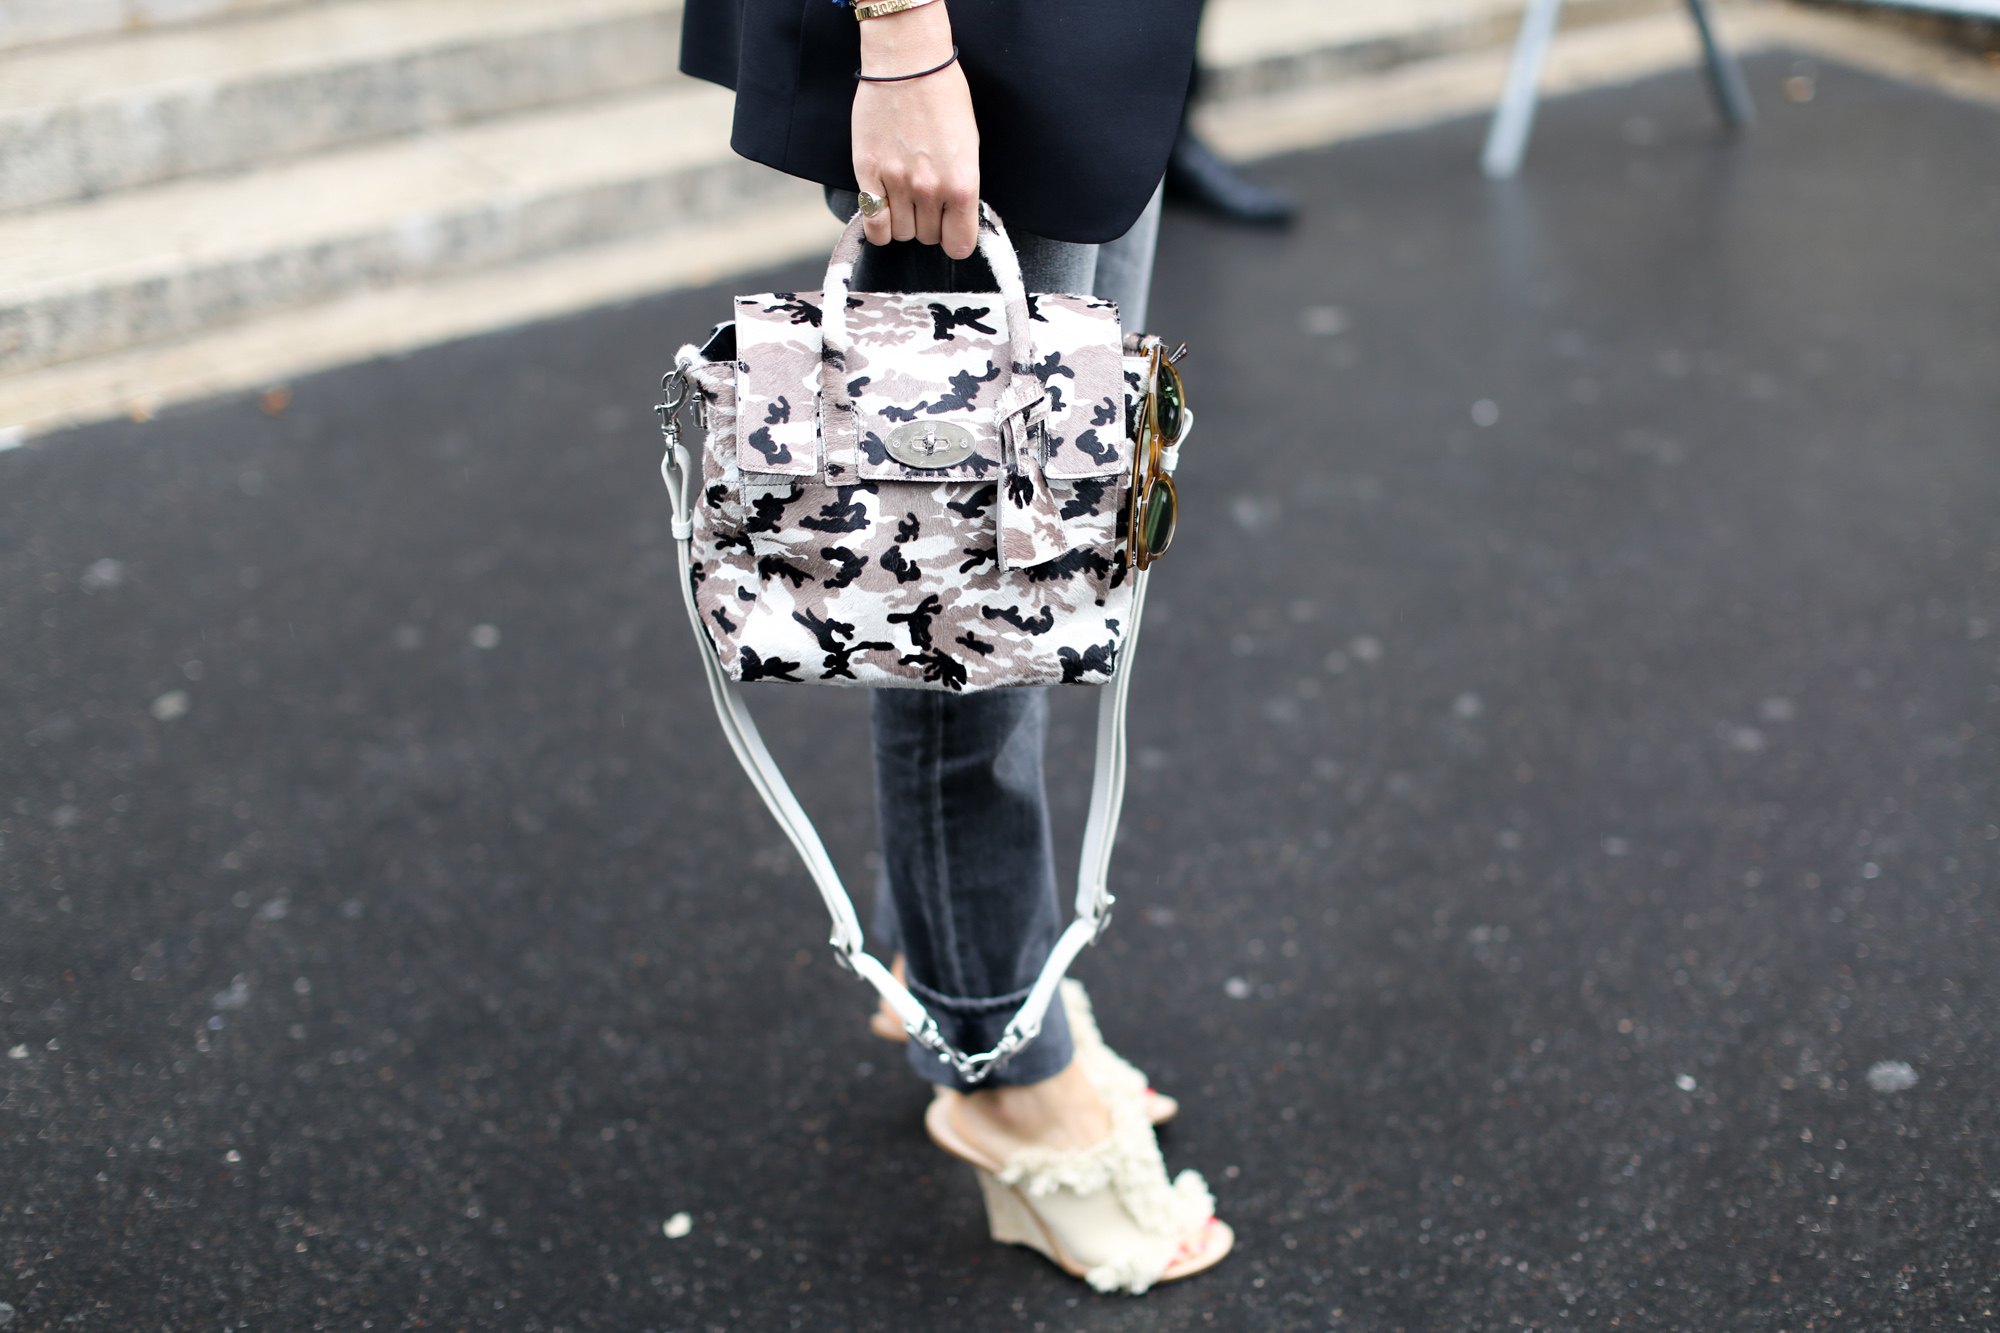 Clochet-streetstyle-paris-fashion-week-leandra-medine-2